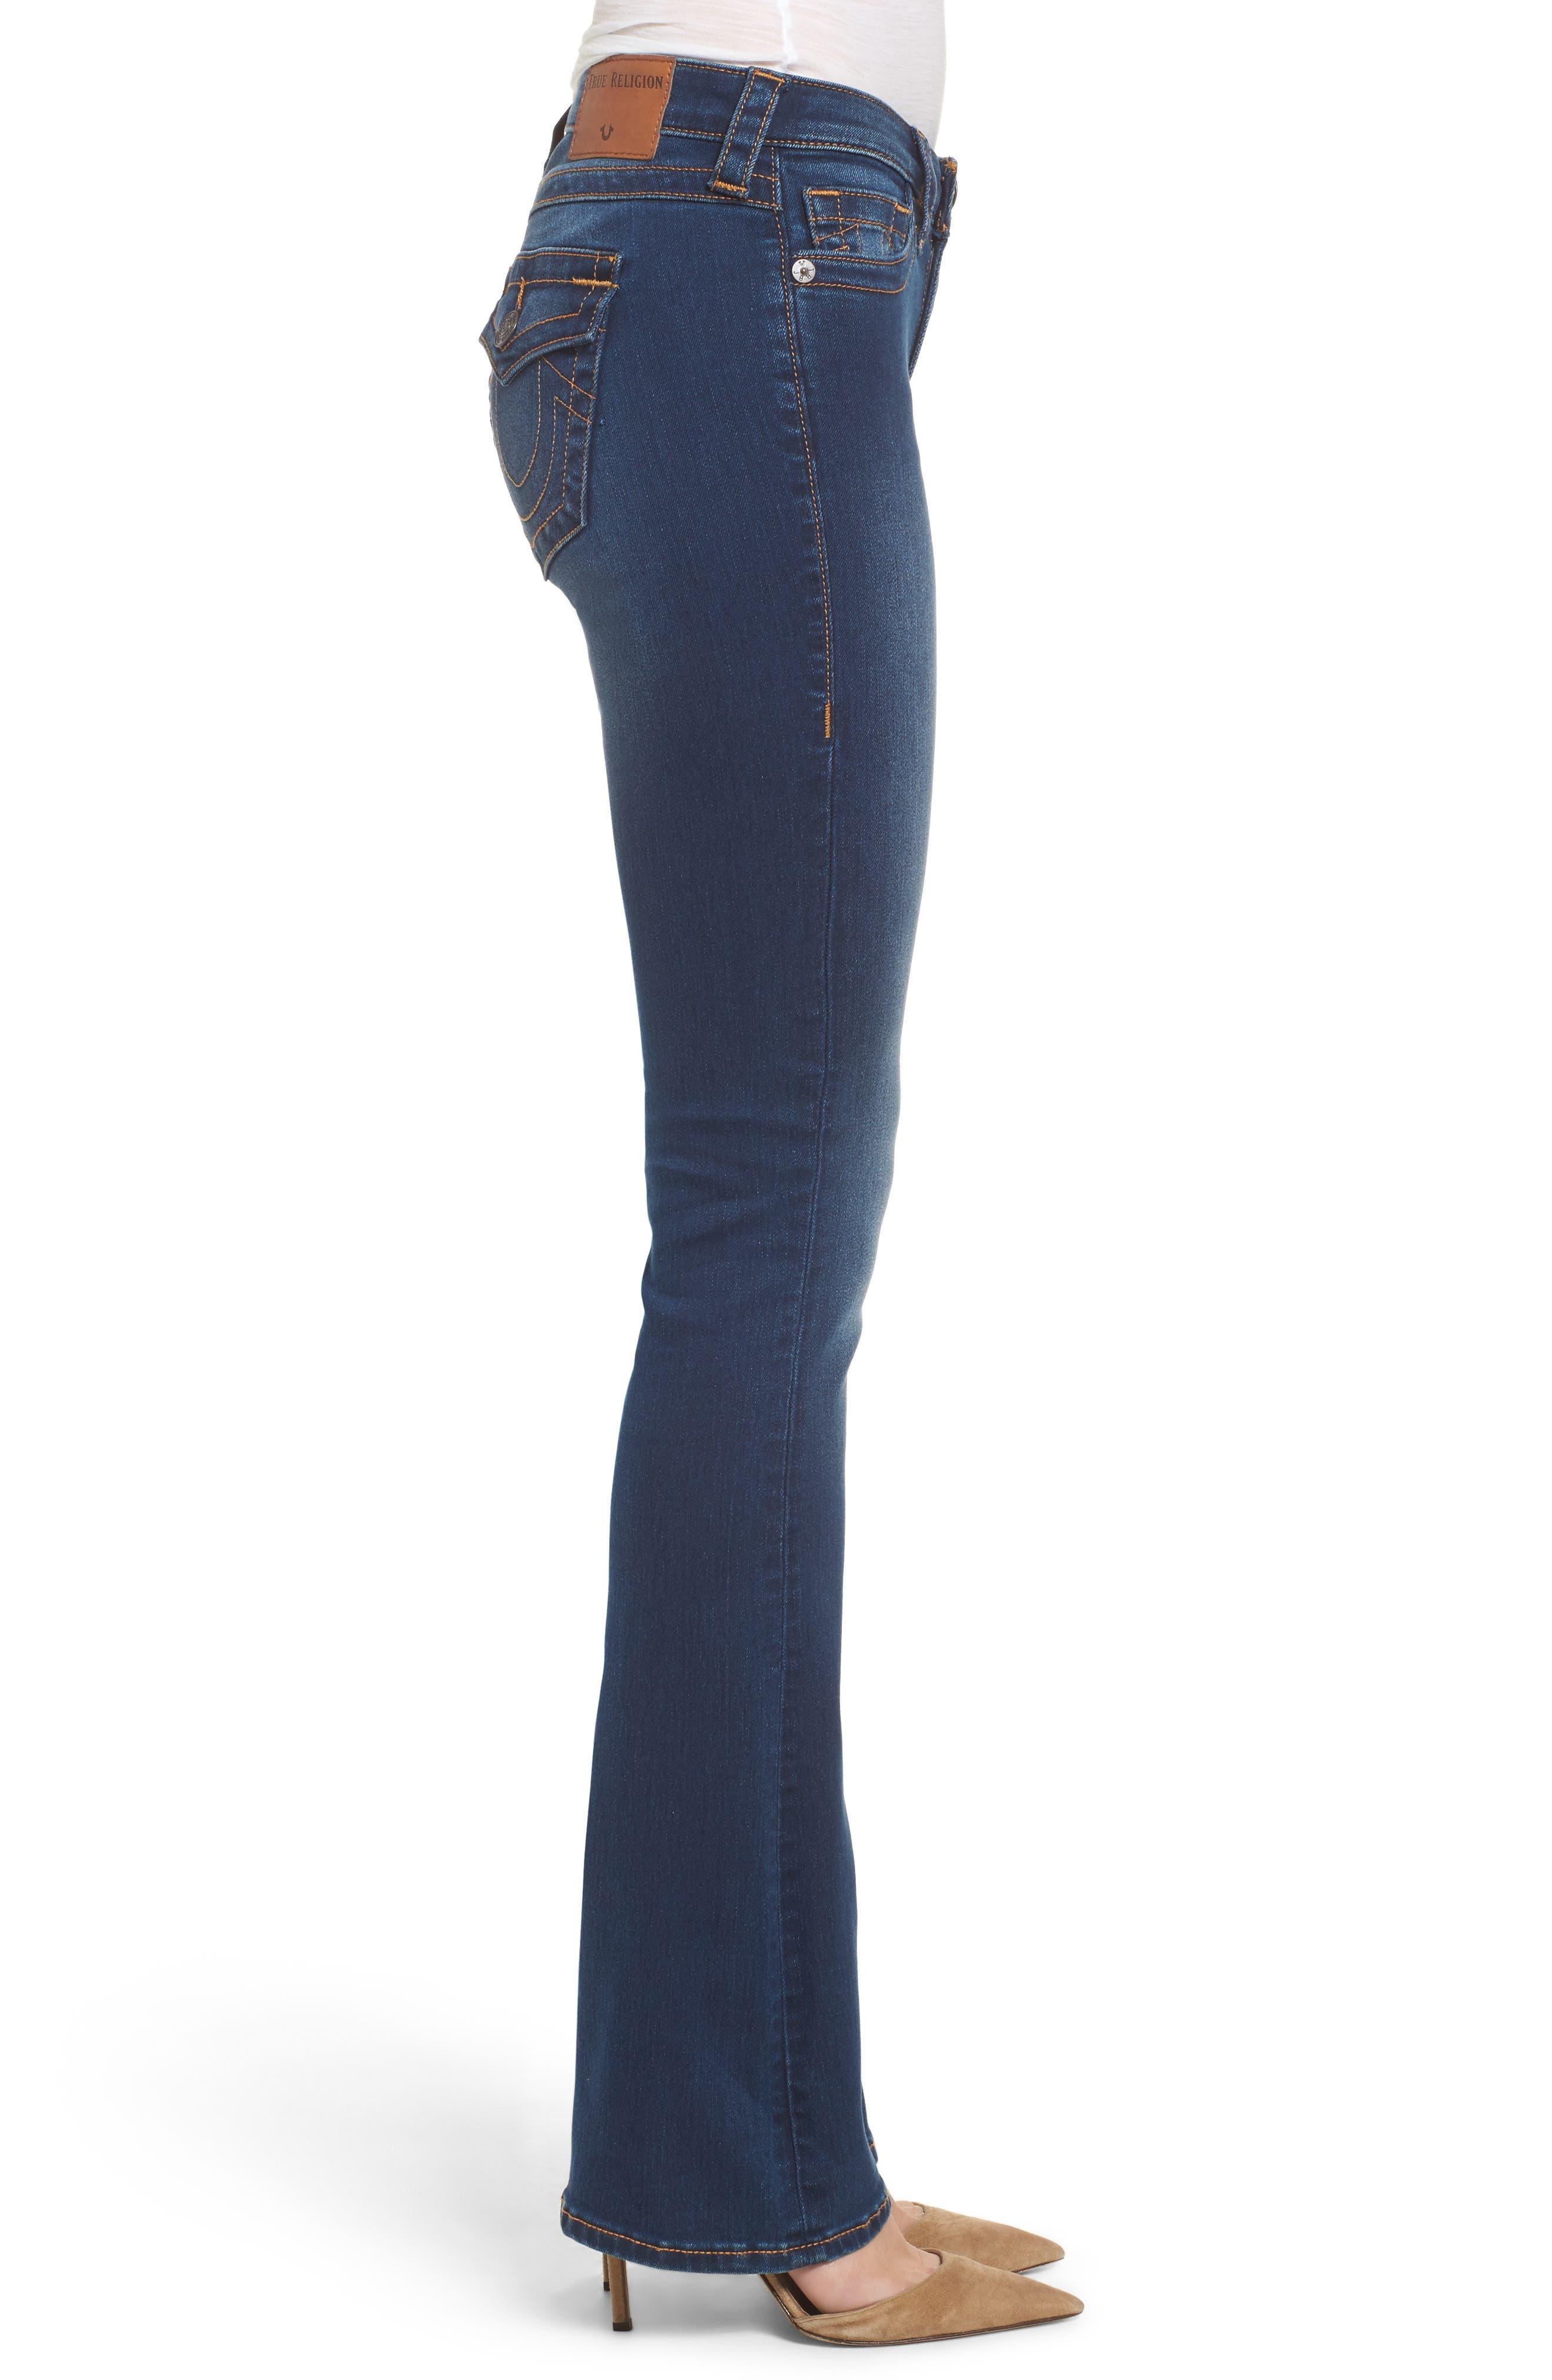 Becca Bootcut Jeans,                             Alternate thumbnail 3, color,                             Lands End Indigo